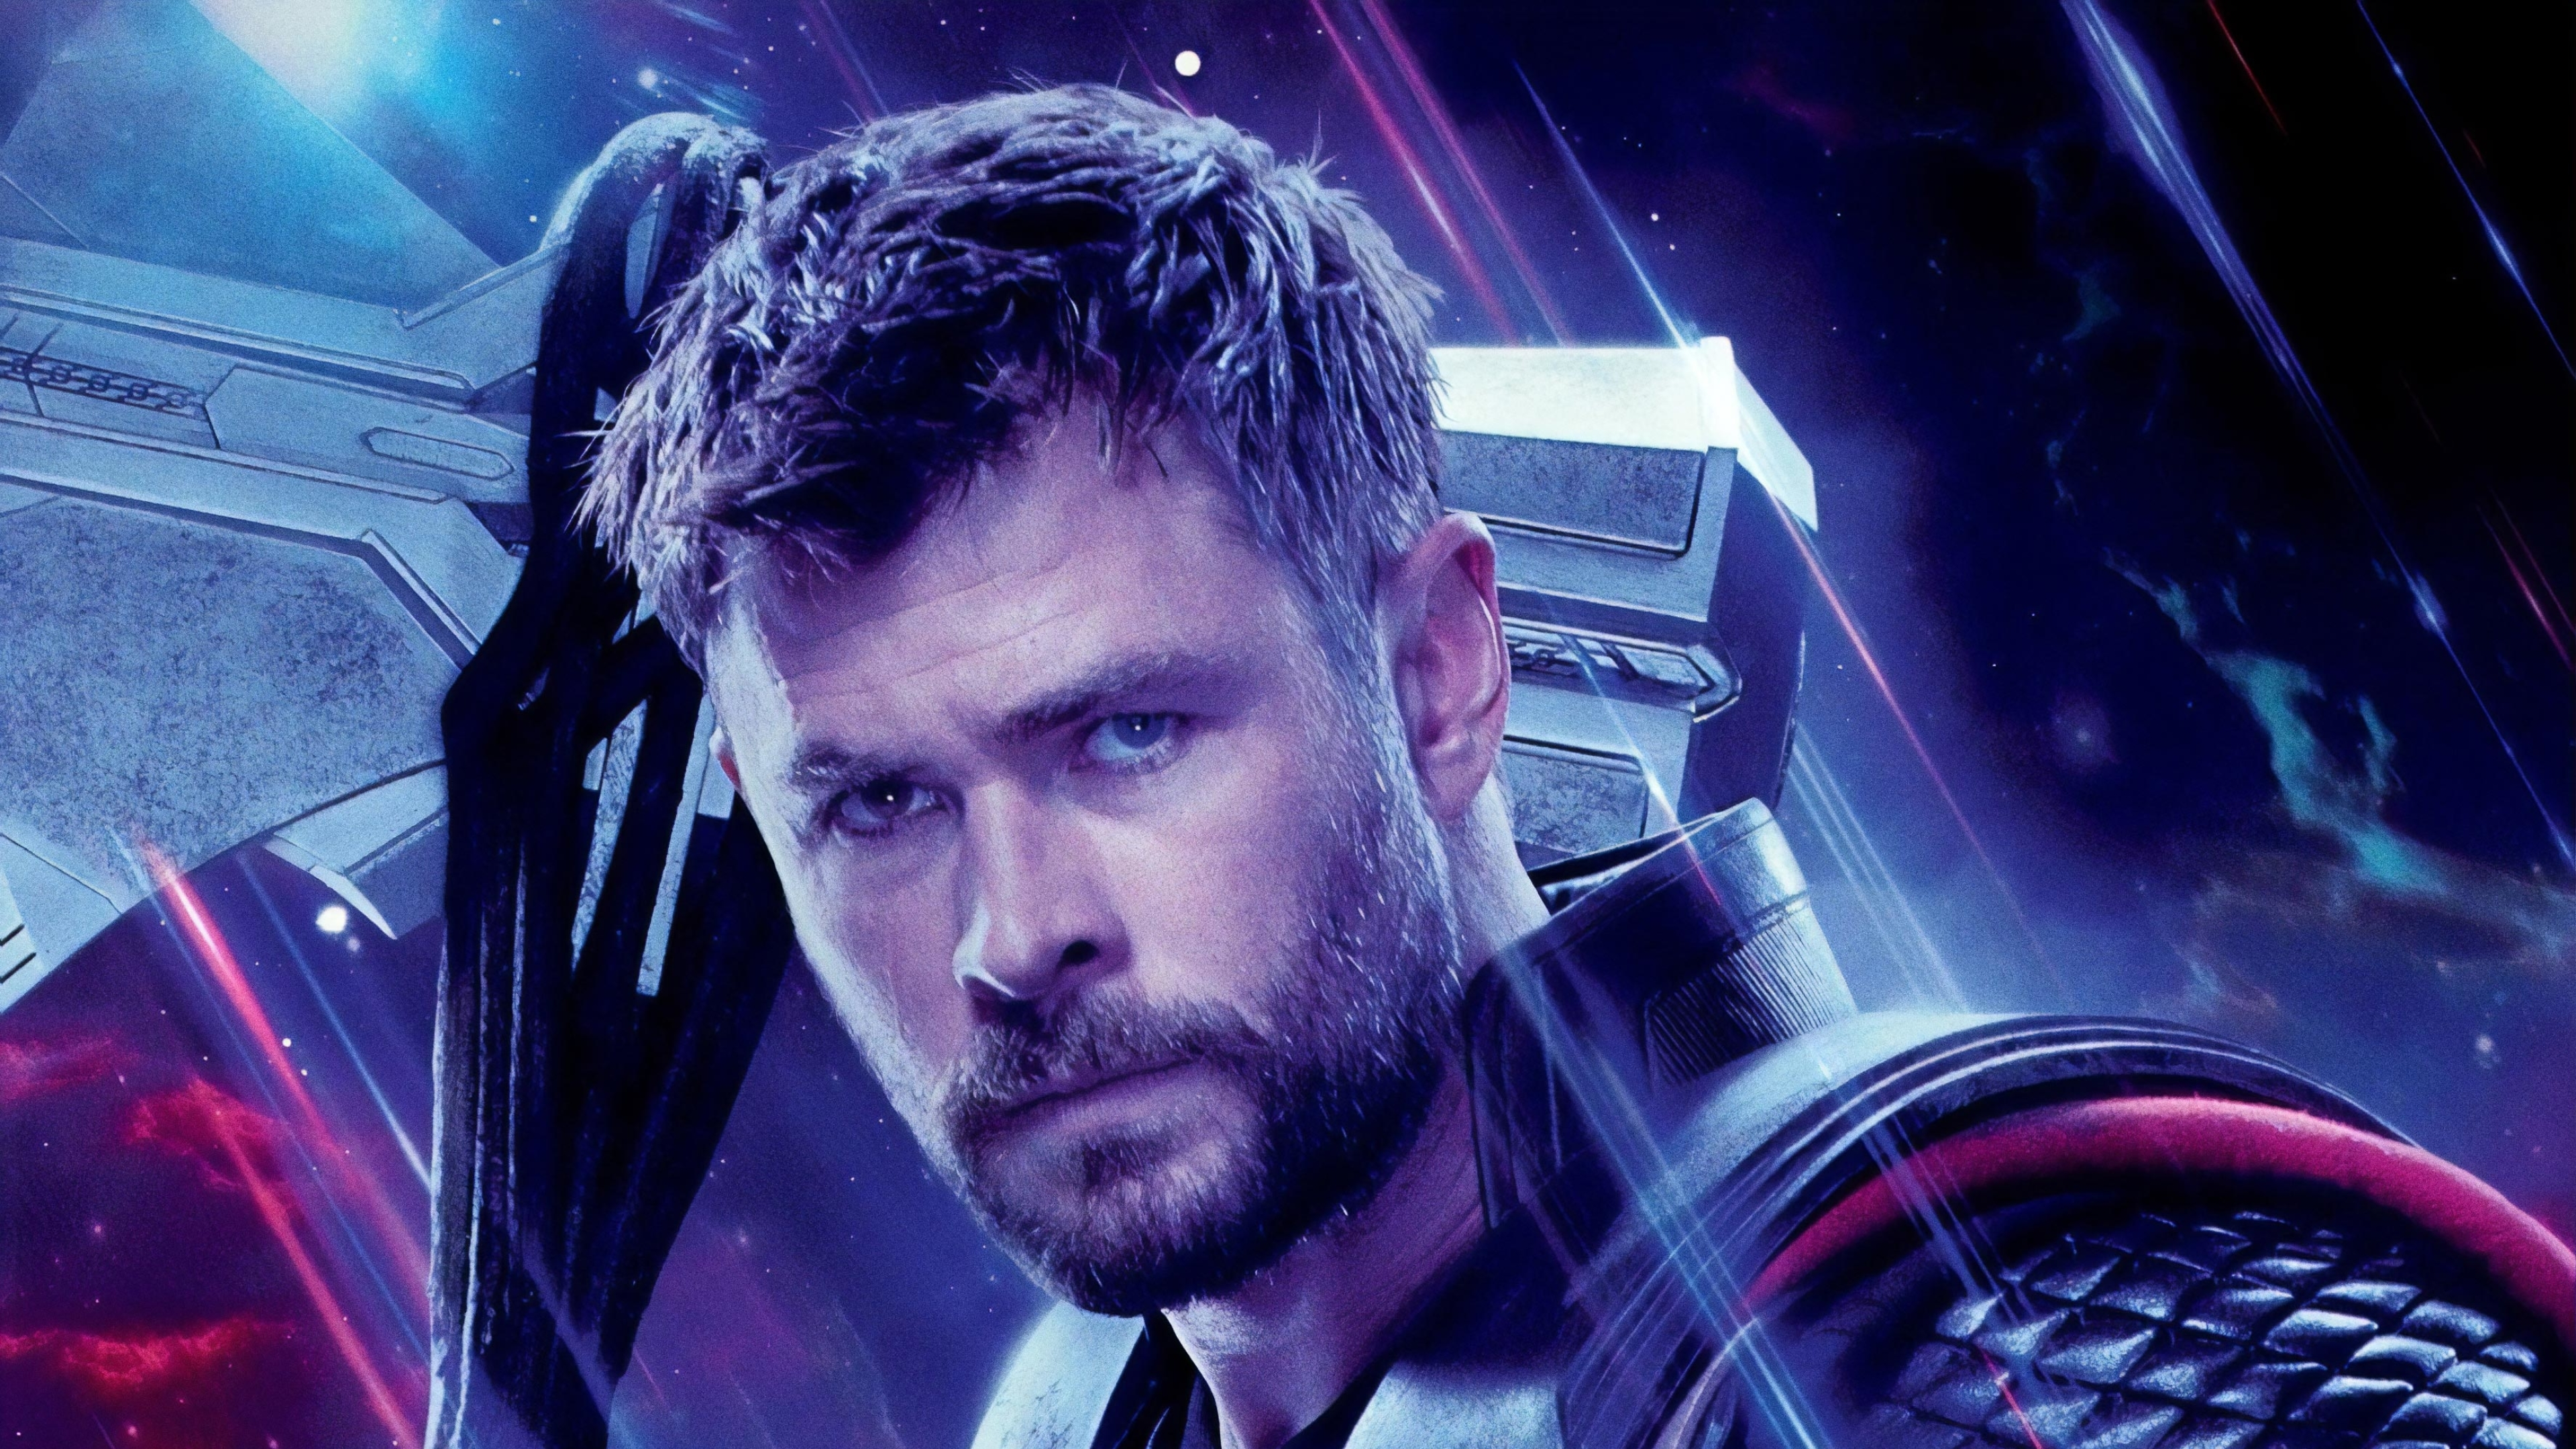 3840x2160 Thor In Avengers Endgame 4k Wallpaper Hd Movies